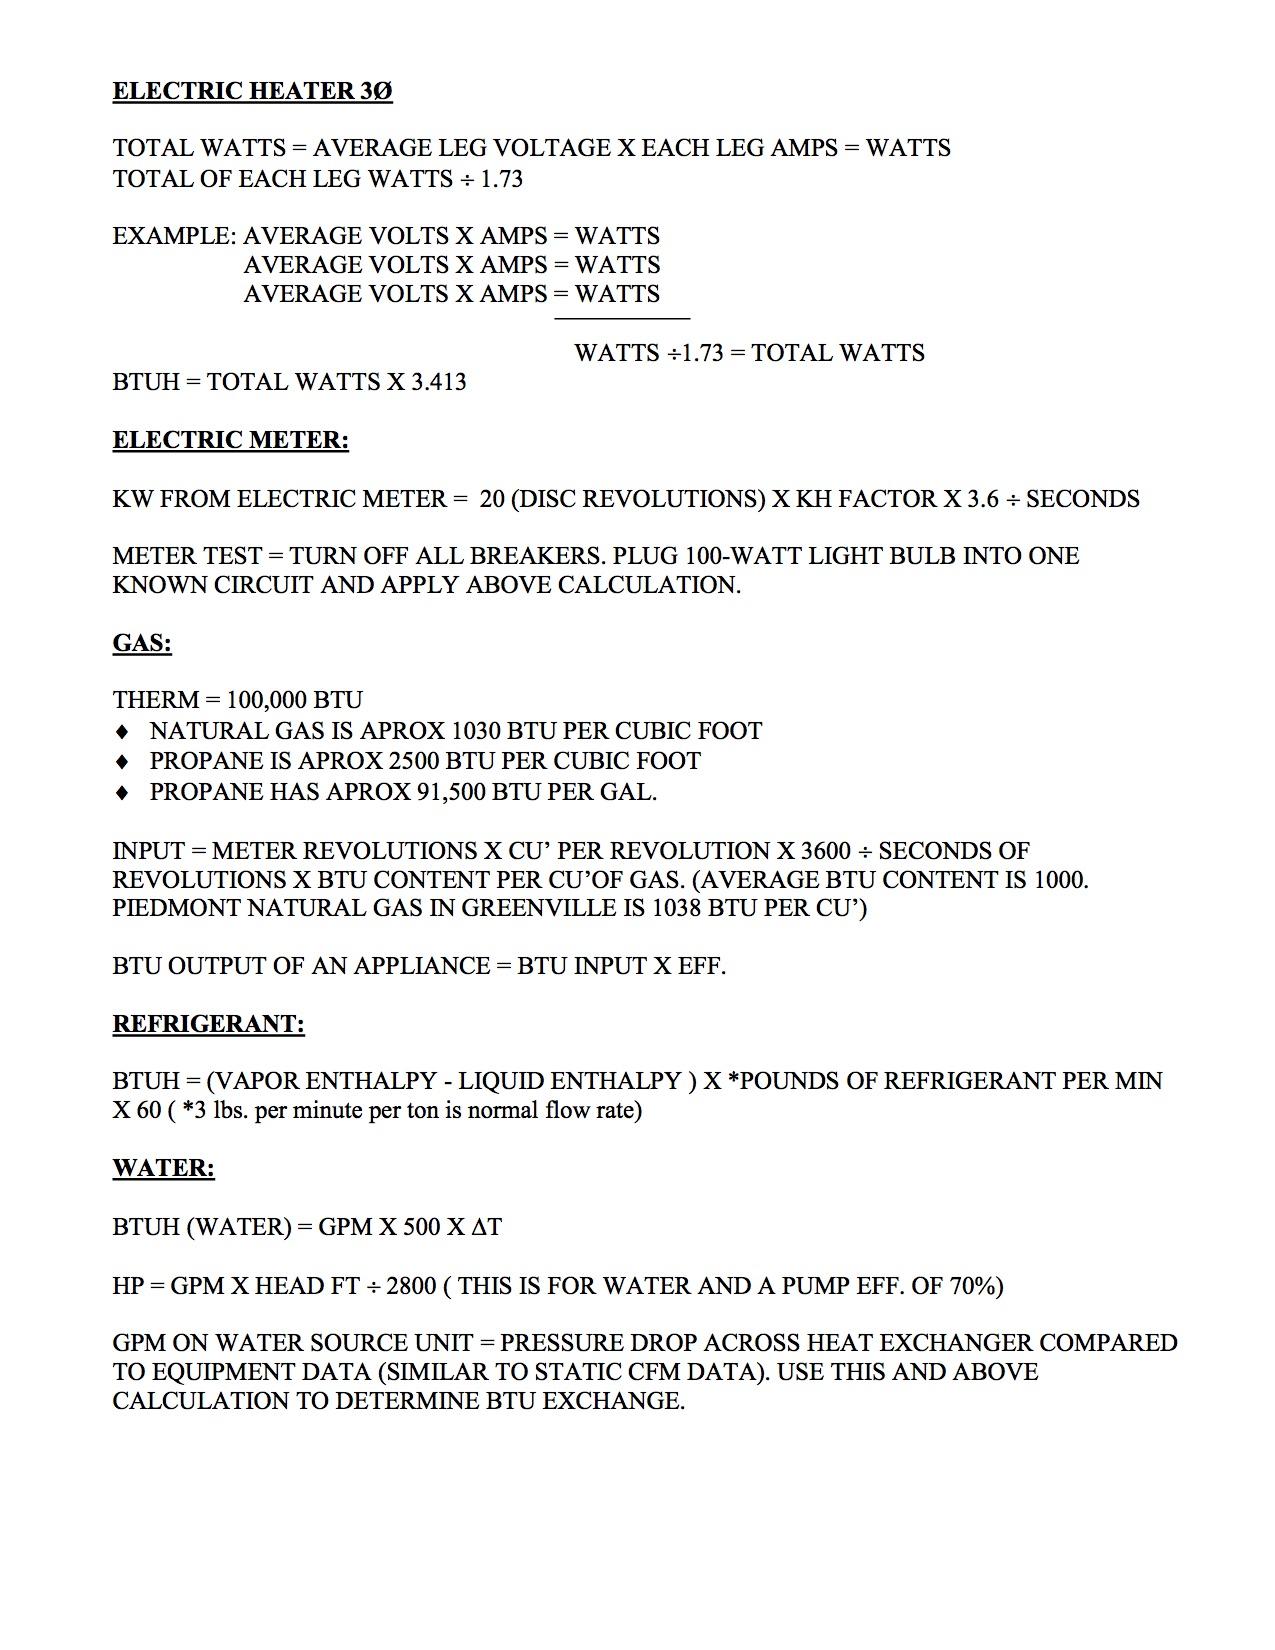 HVAC Formulas 2 - SCAHACC